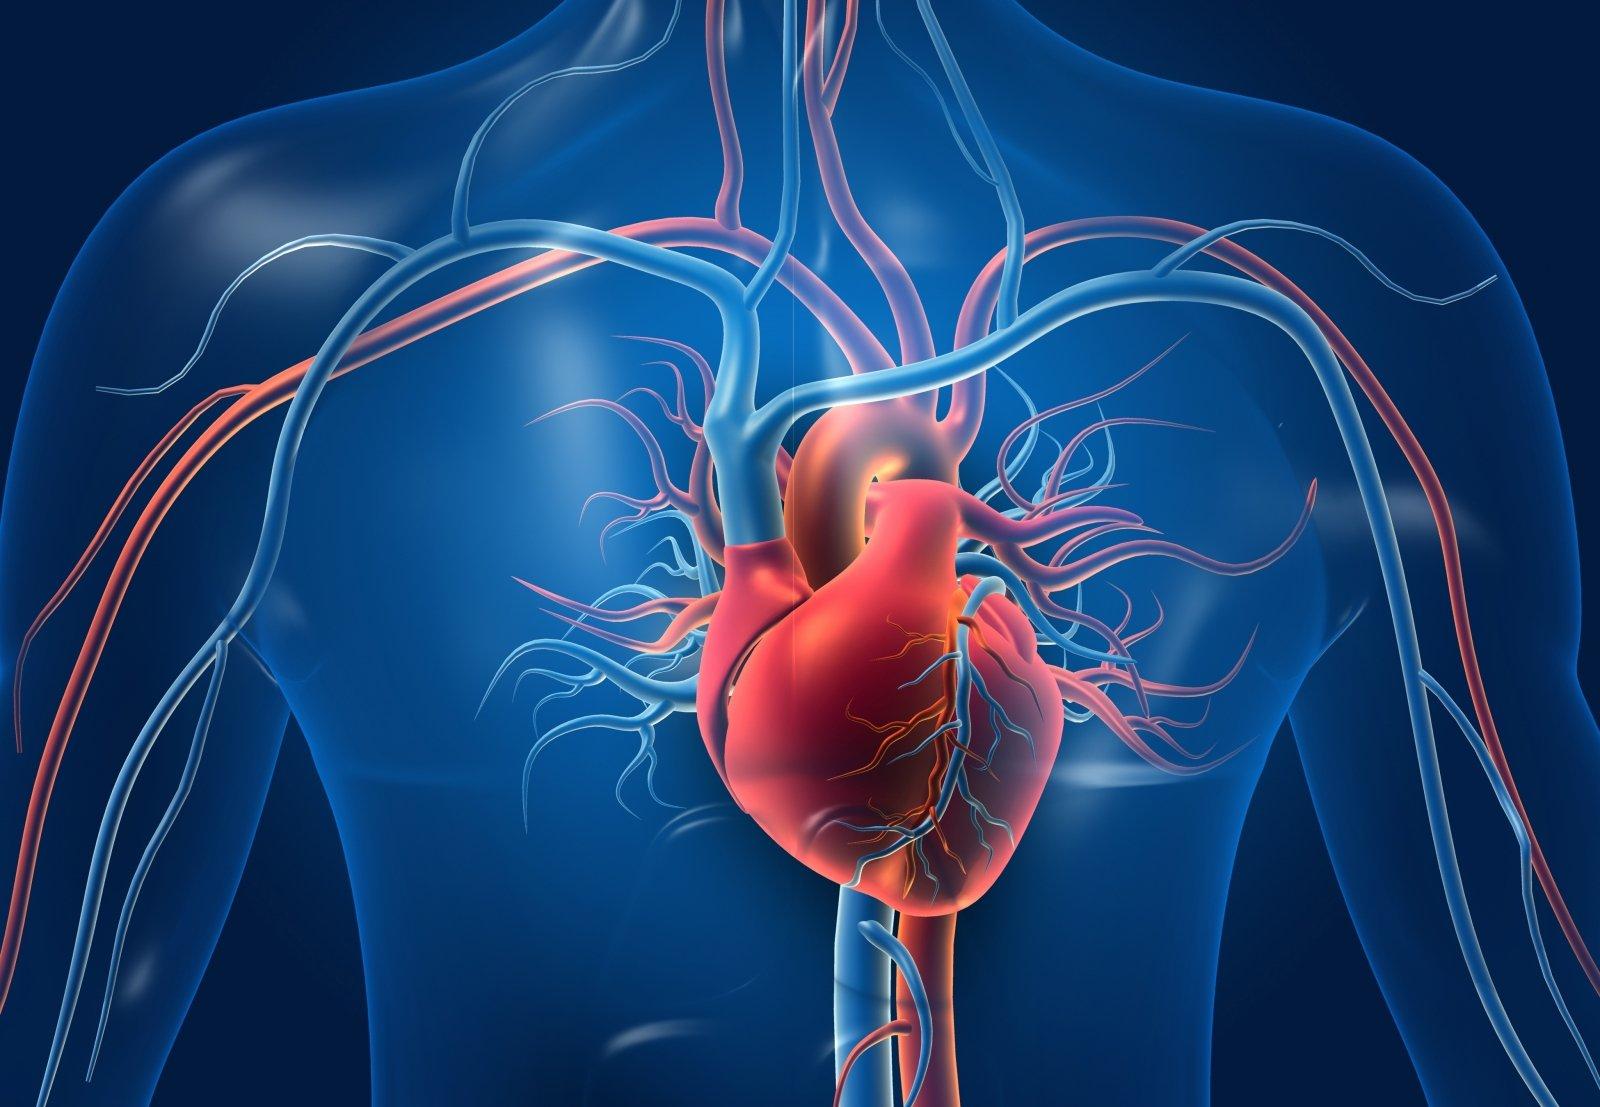 Paprastas būdas patikrinti širdies sveikatą: užtruksite vos 5 minutes | eagles.lt